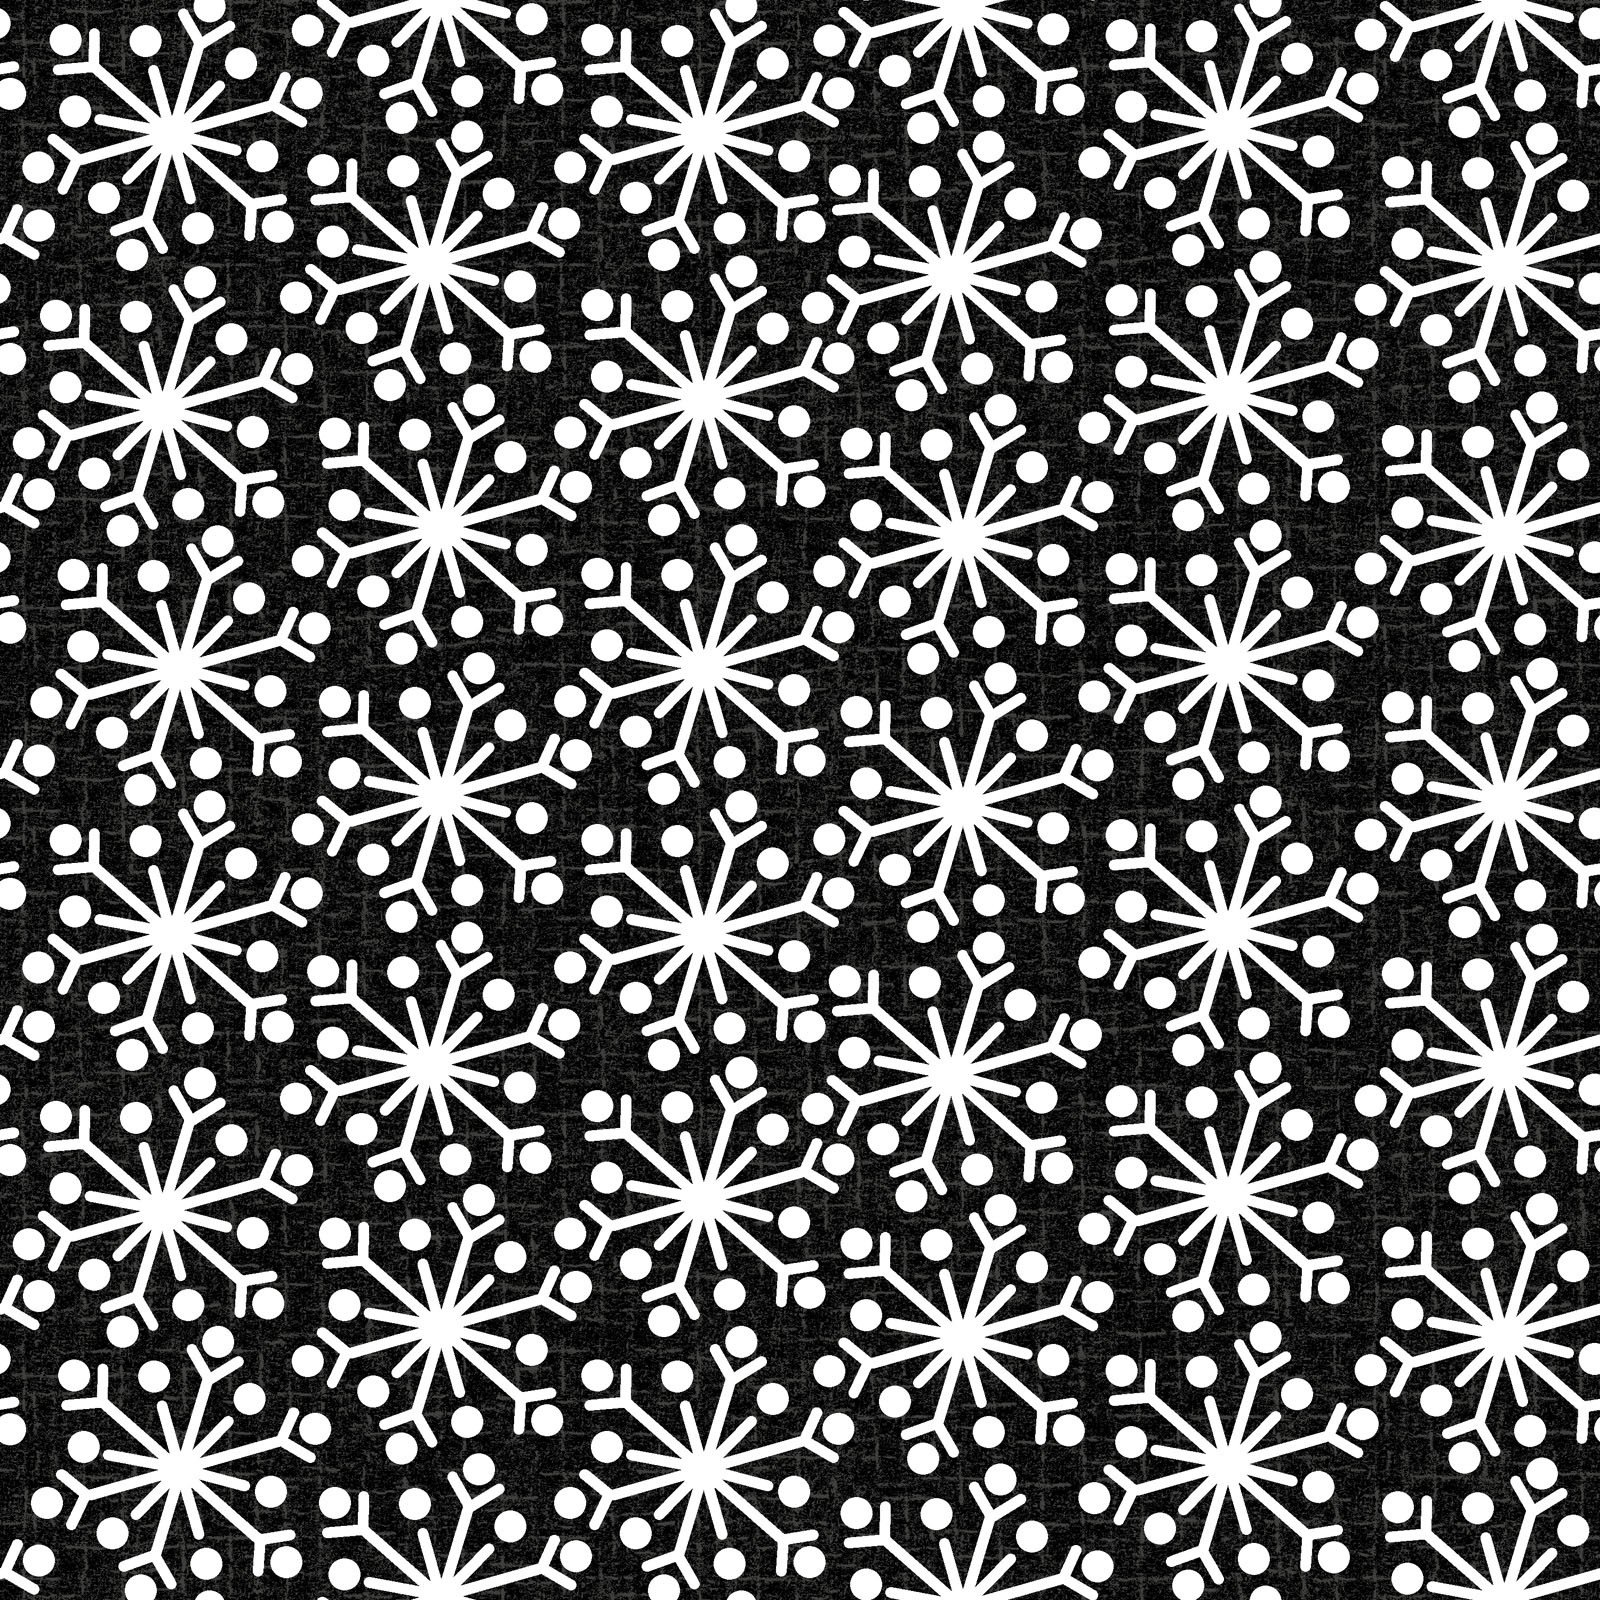 Snowdays Flannel - Snowflake 9938 JK Charcoal